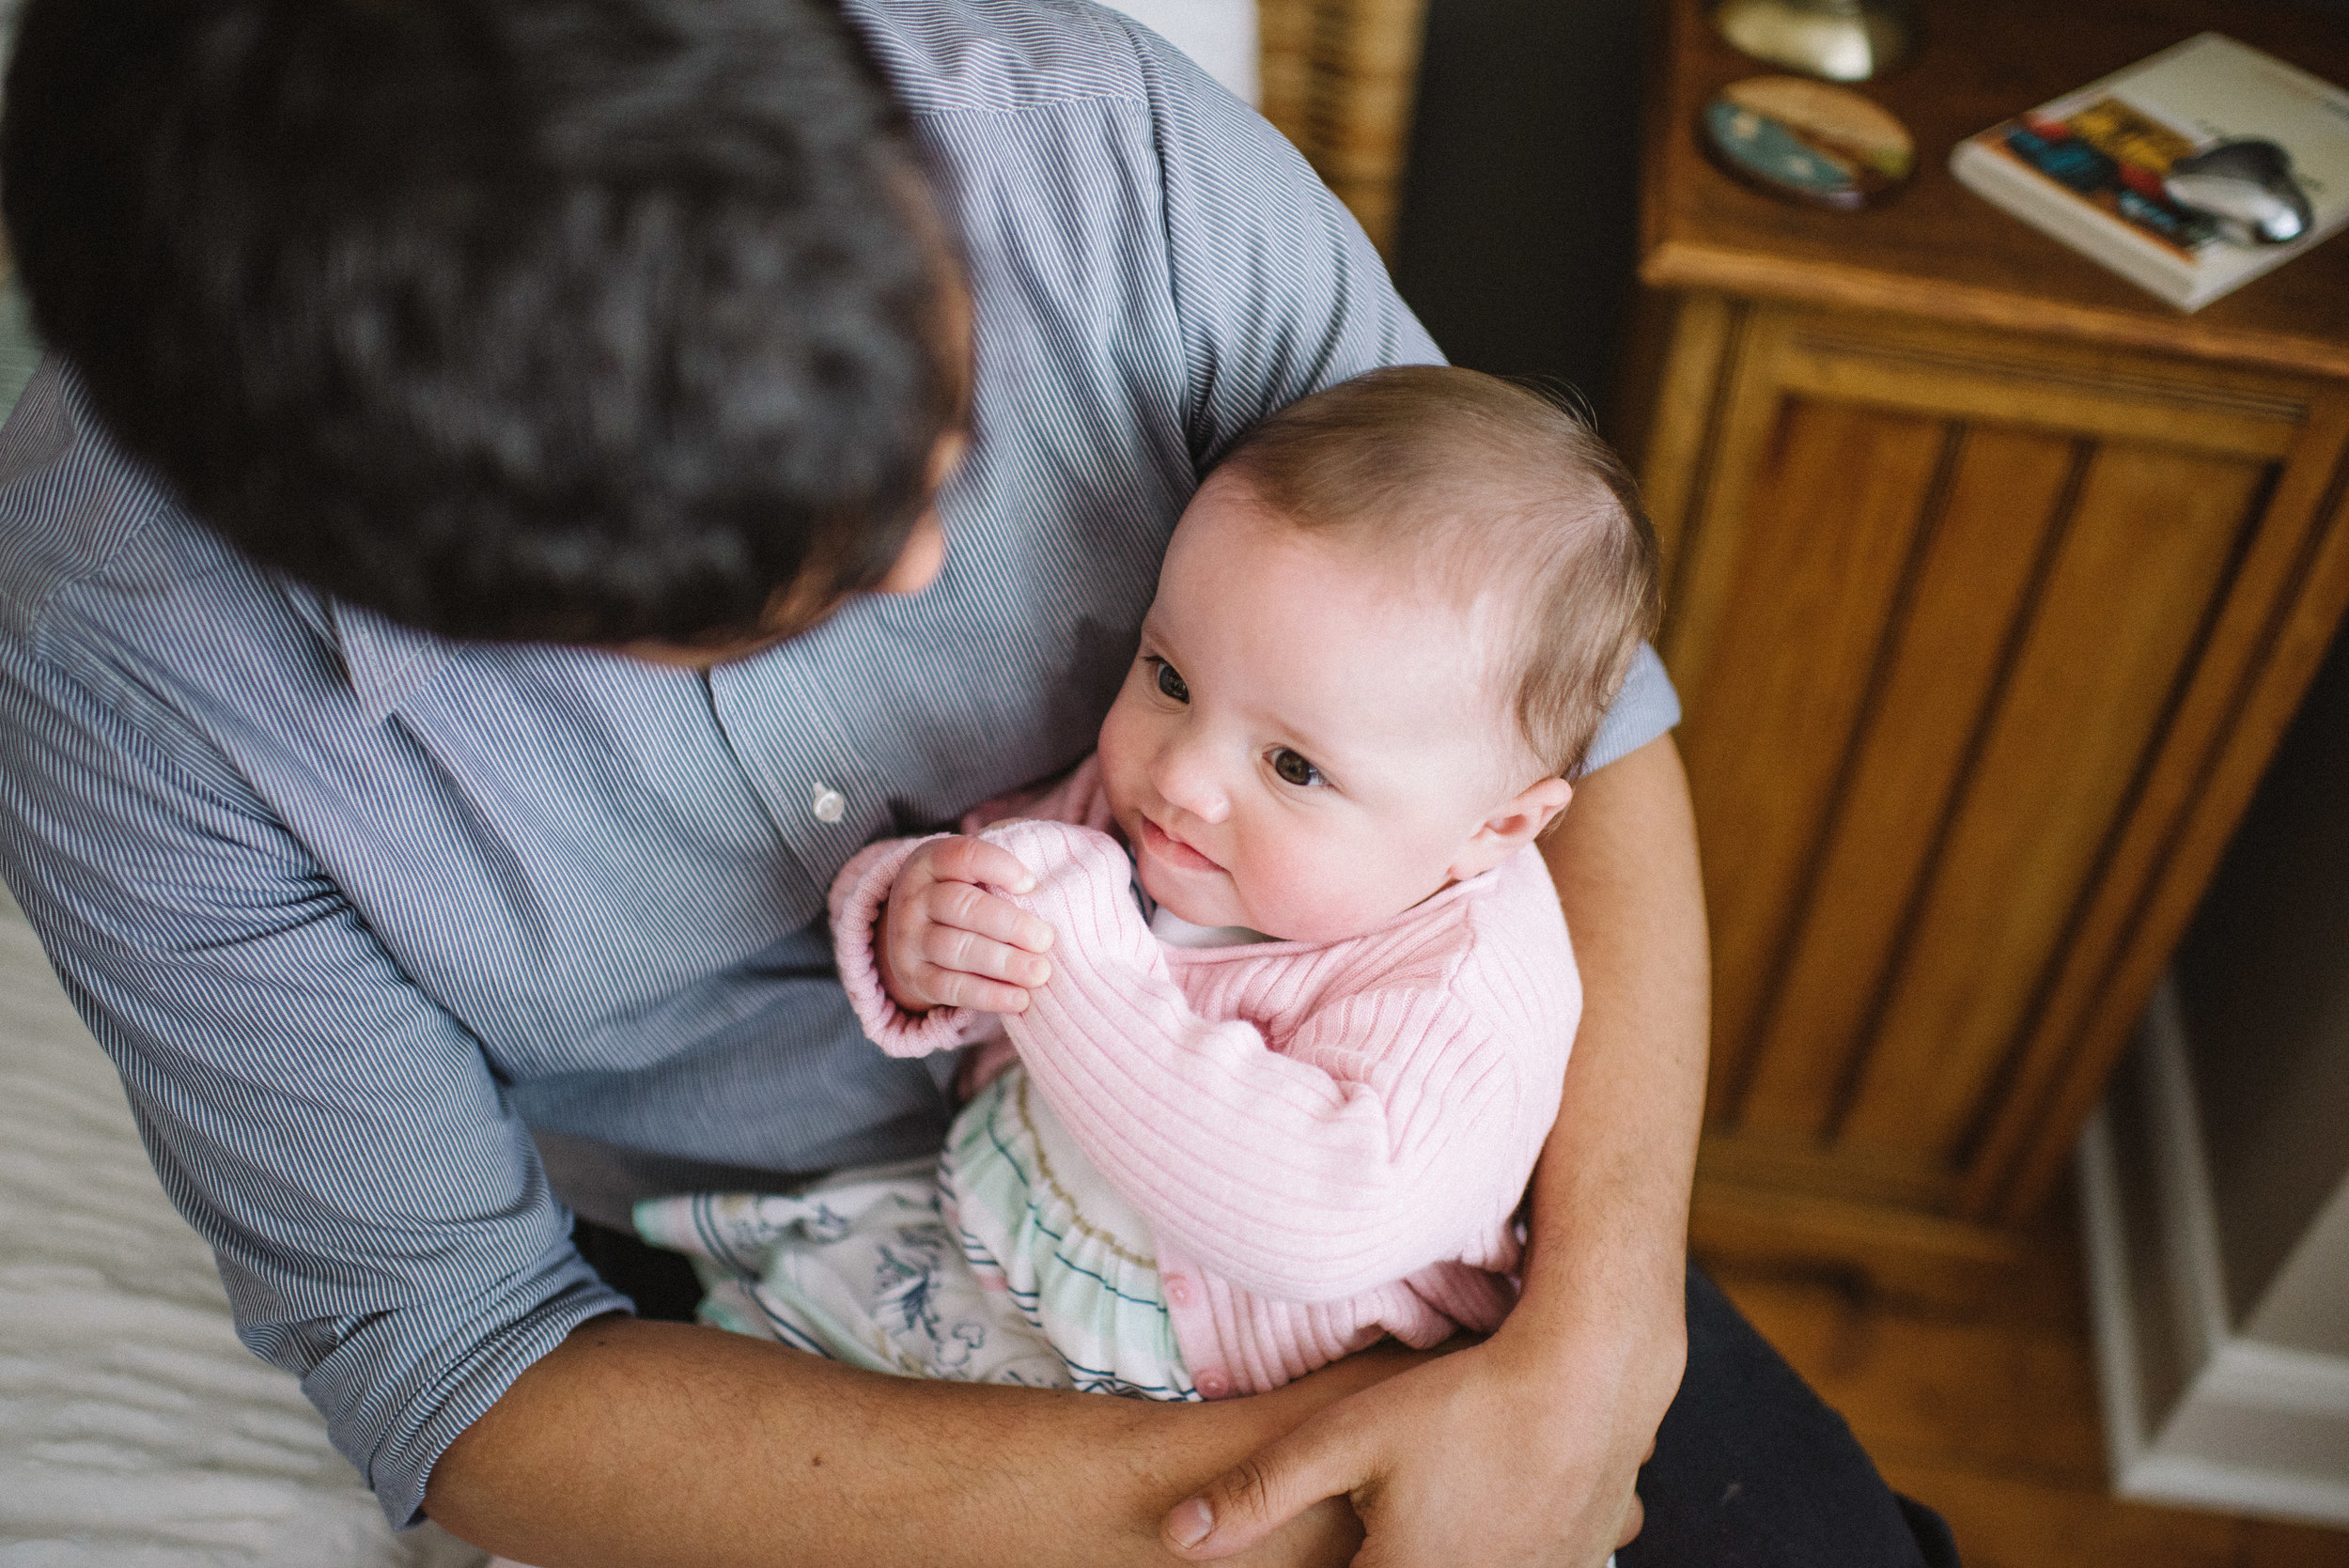 0034-ALTERNATIVE-WEDDING-PHOTOGRAPHER-GLASGOW-FAMILY-PHOTOGRAPHER-KIDS-PORTRAITS-BABY-PORTRAITS-GLASGOW.JPG